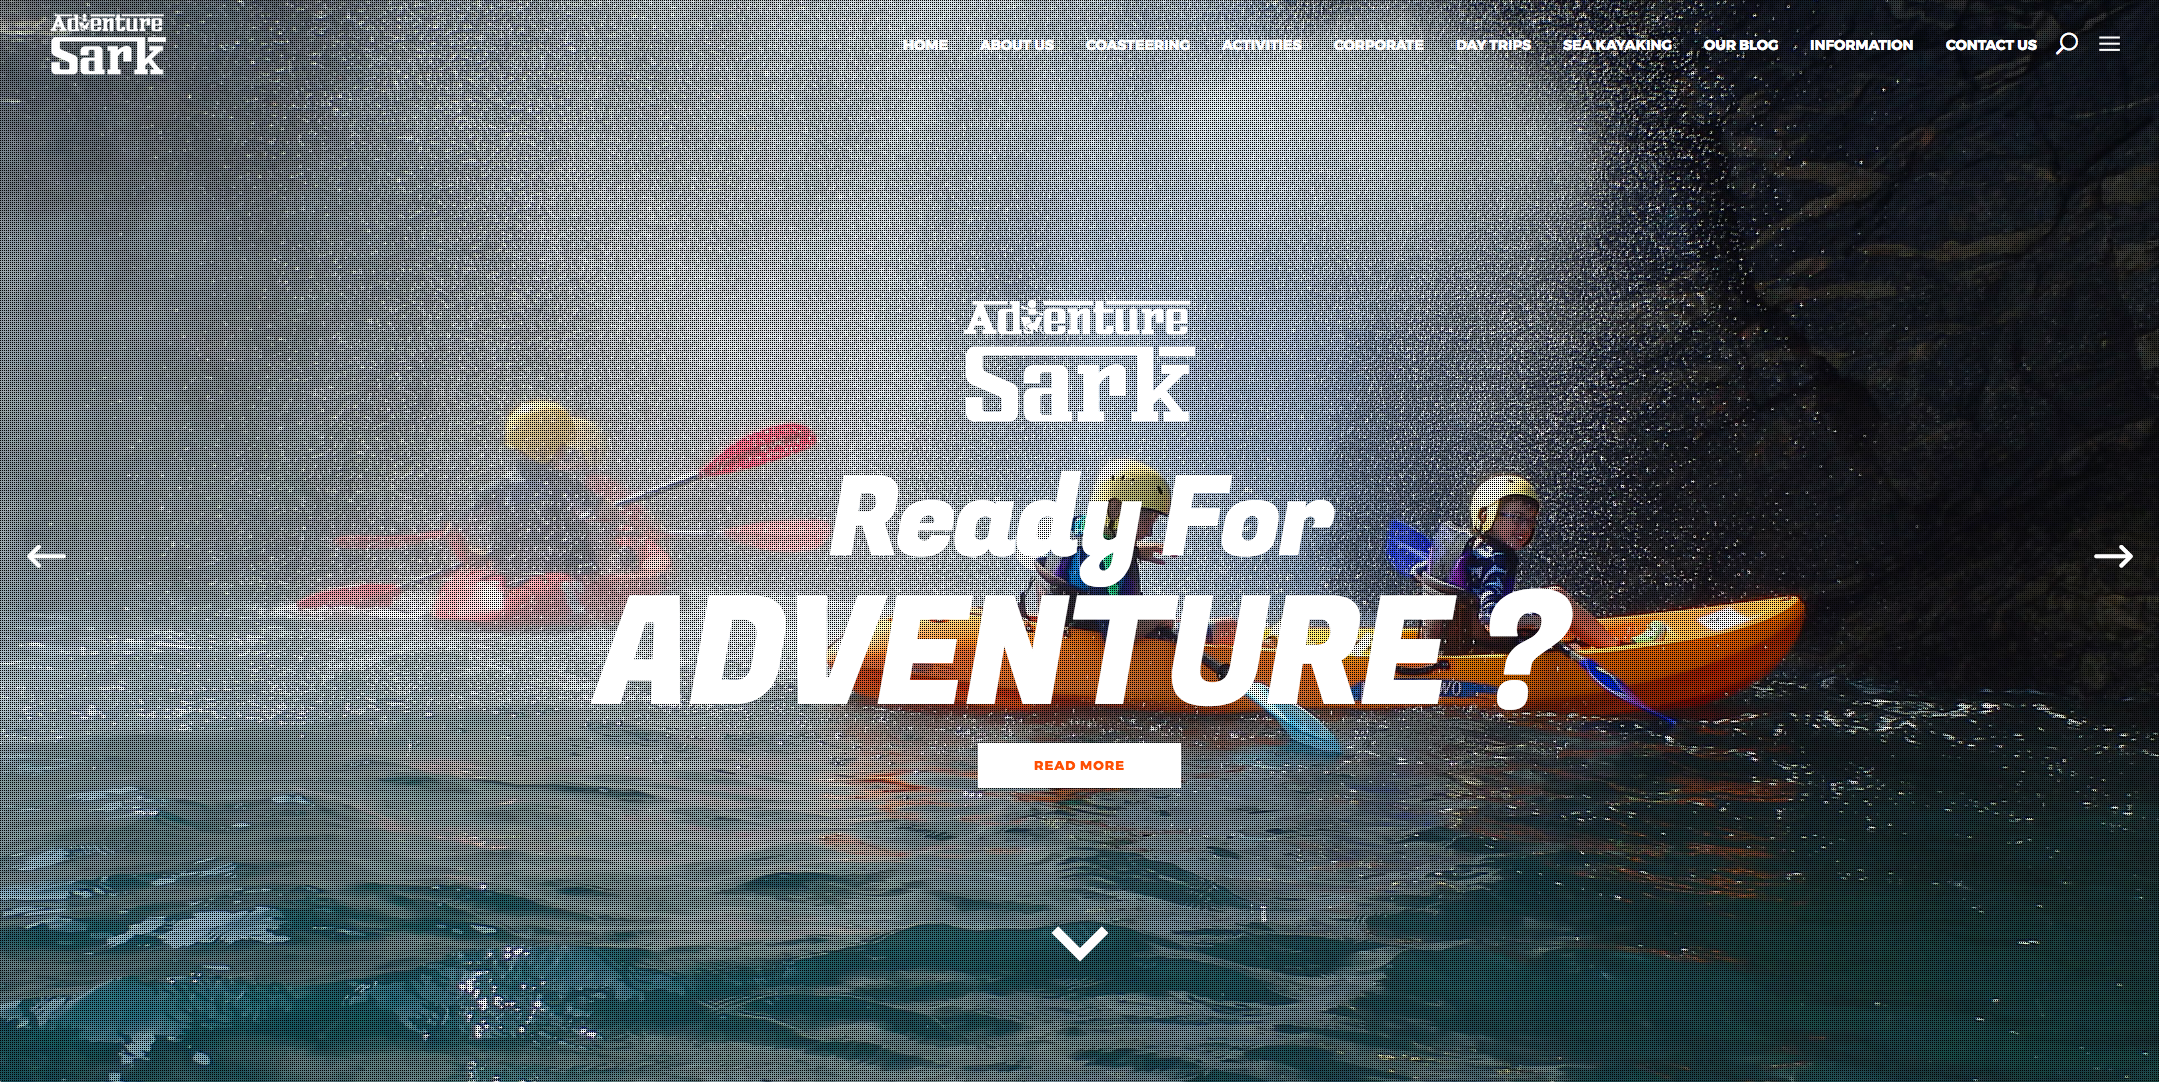 Adventure Sark Website 2019